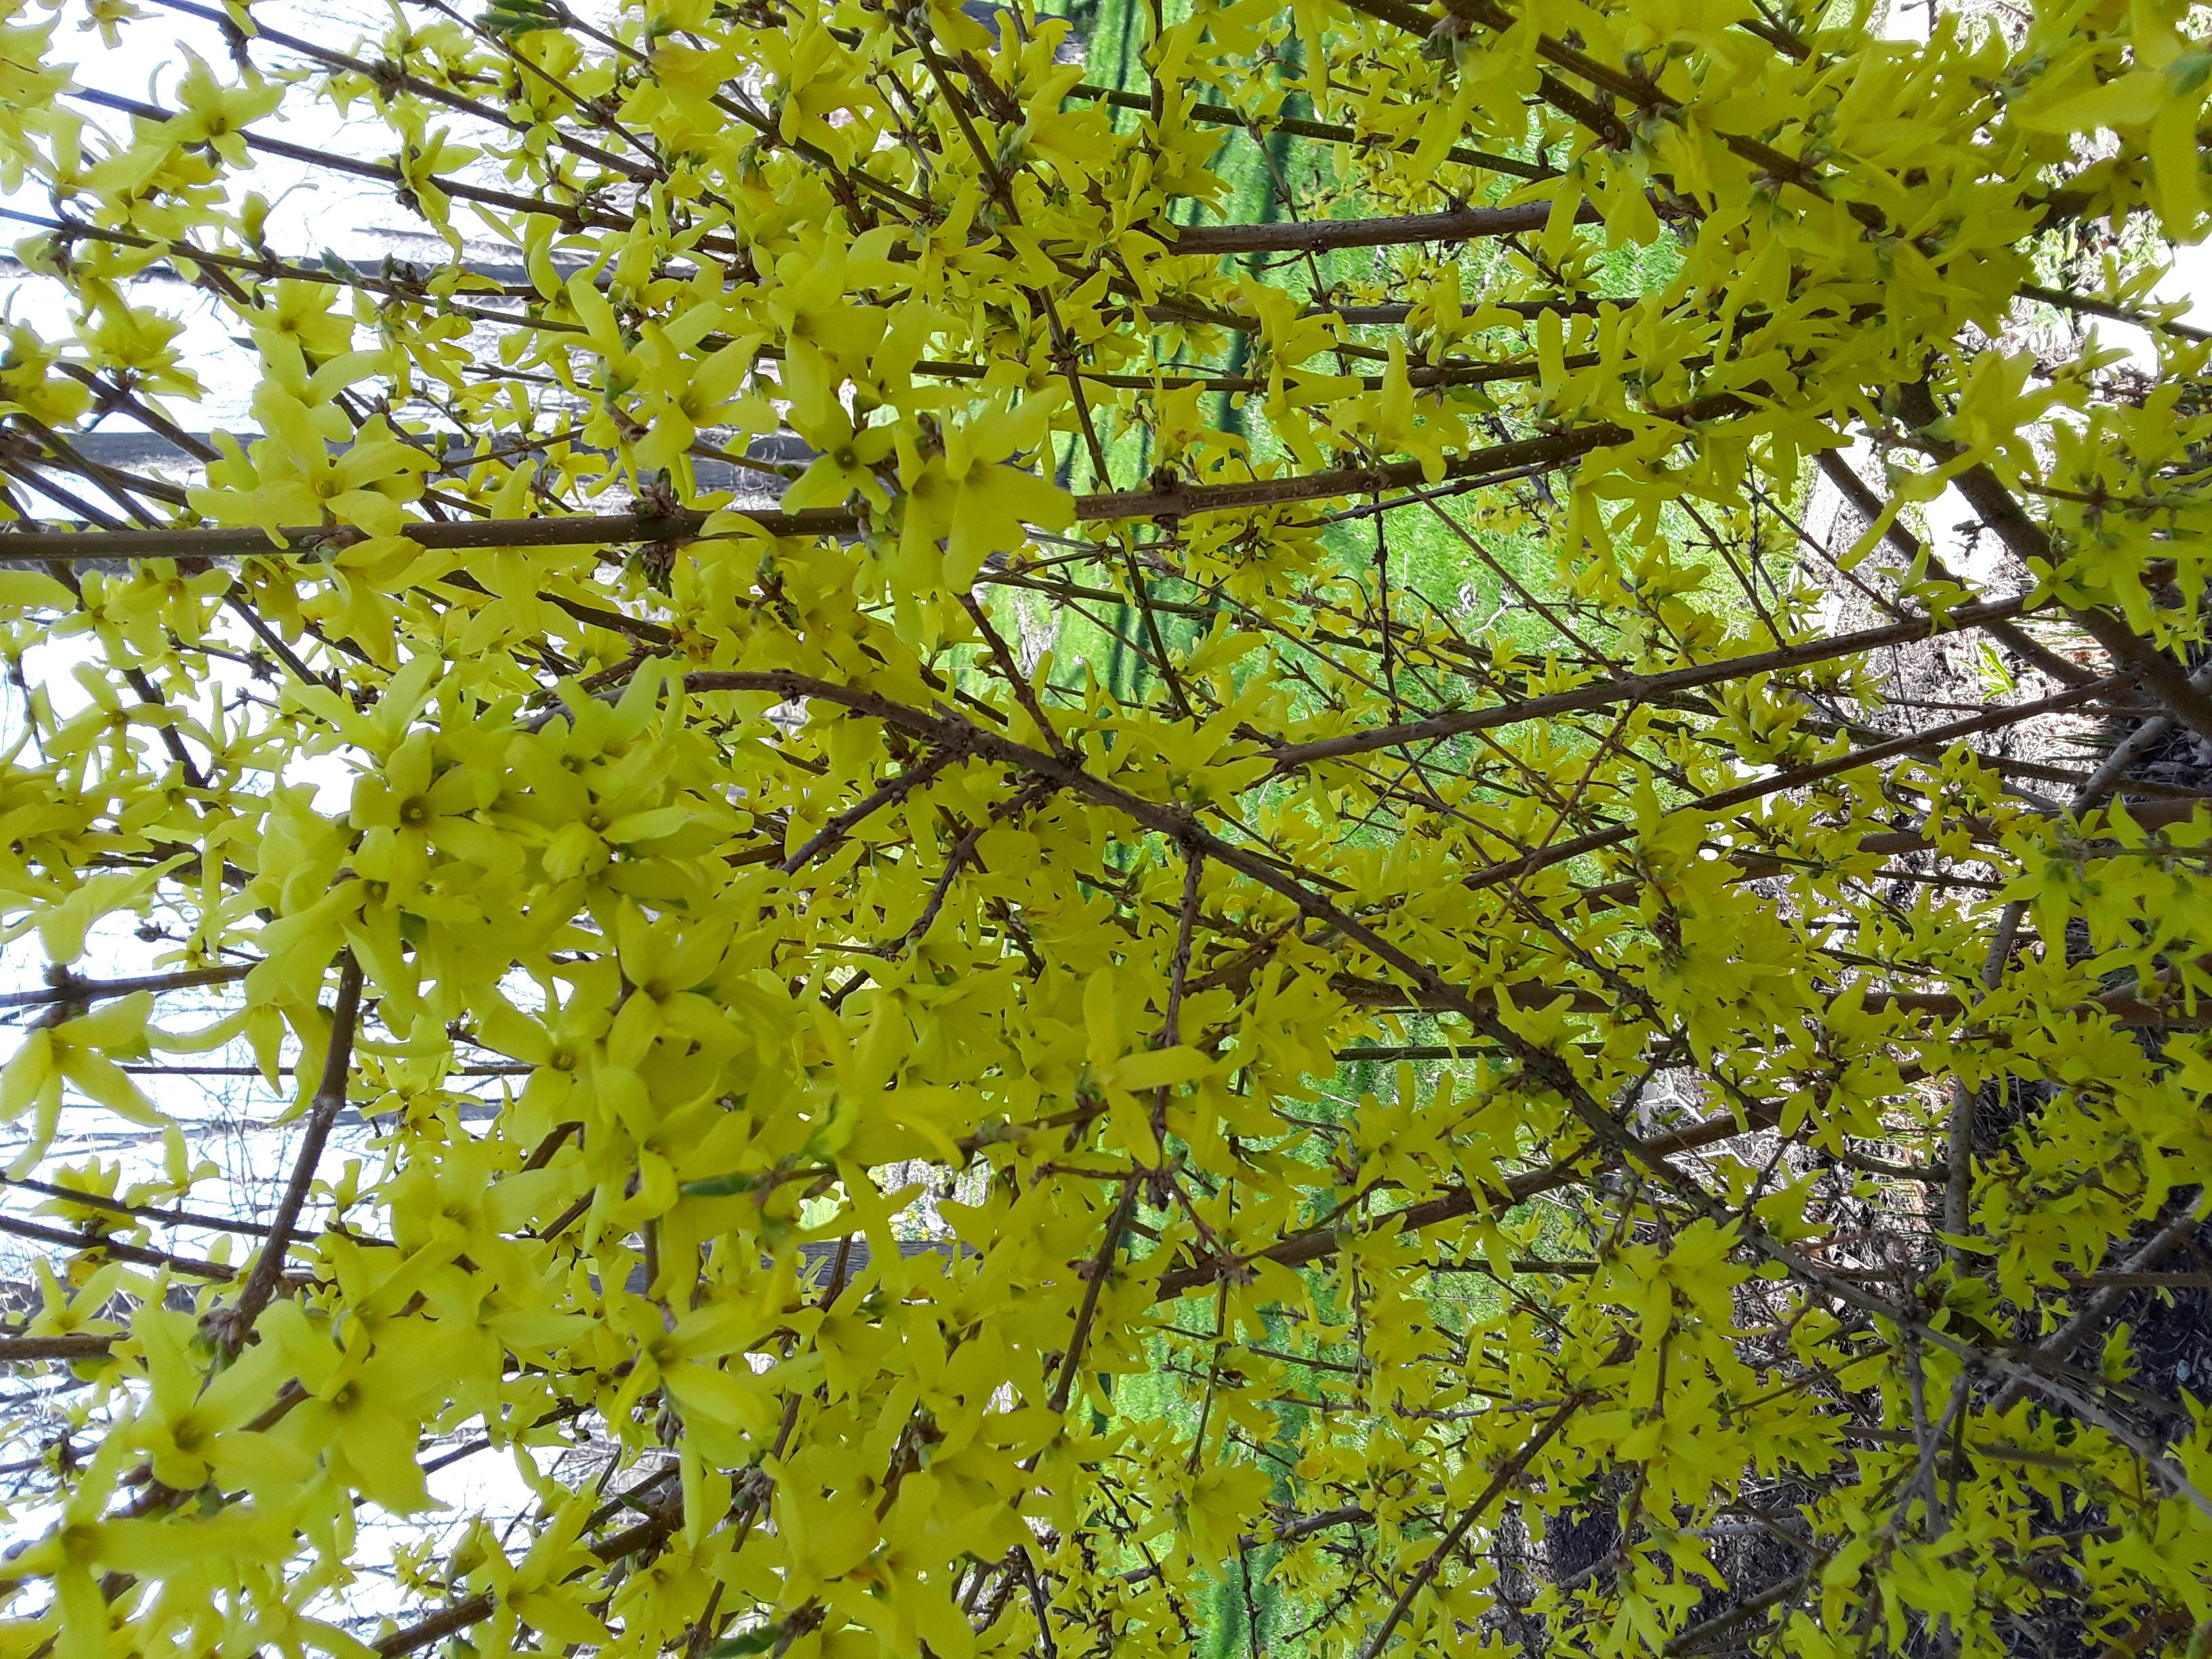 forsythia bush with heavy yellow bloom